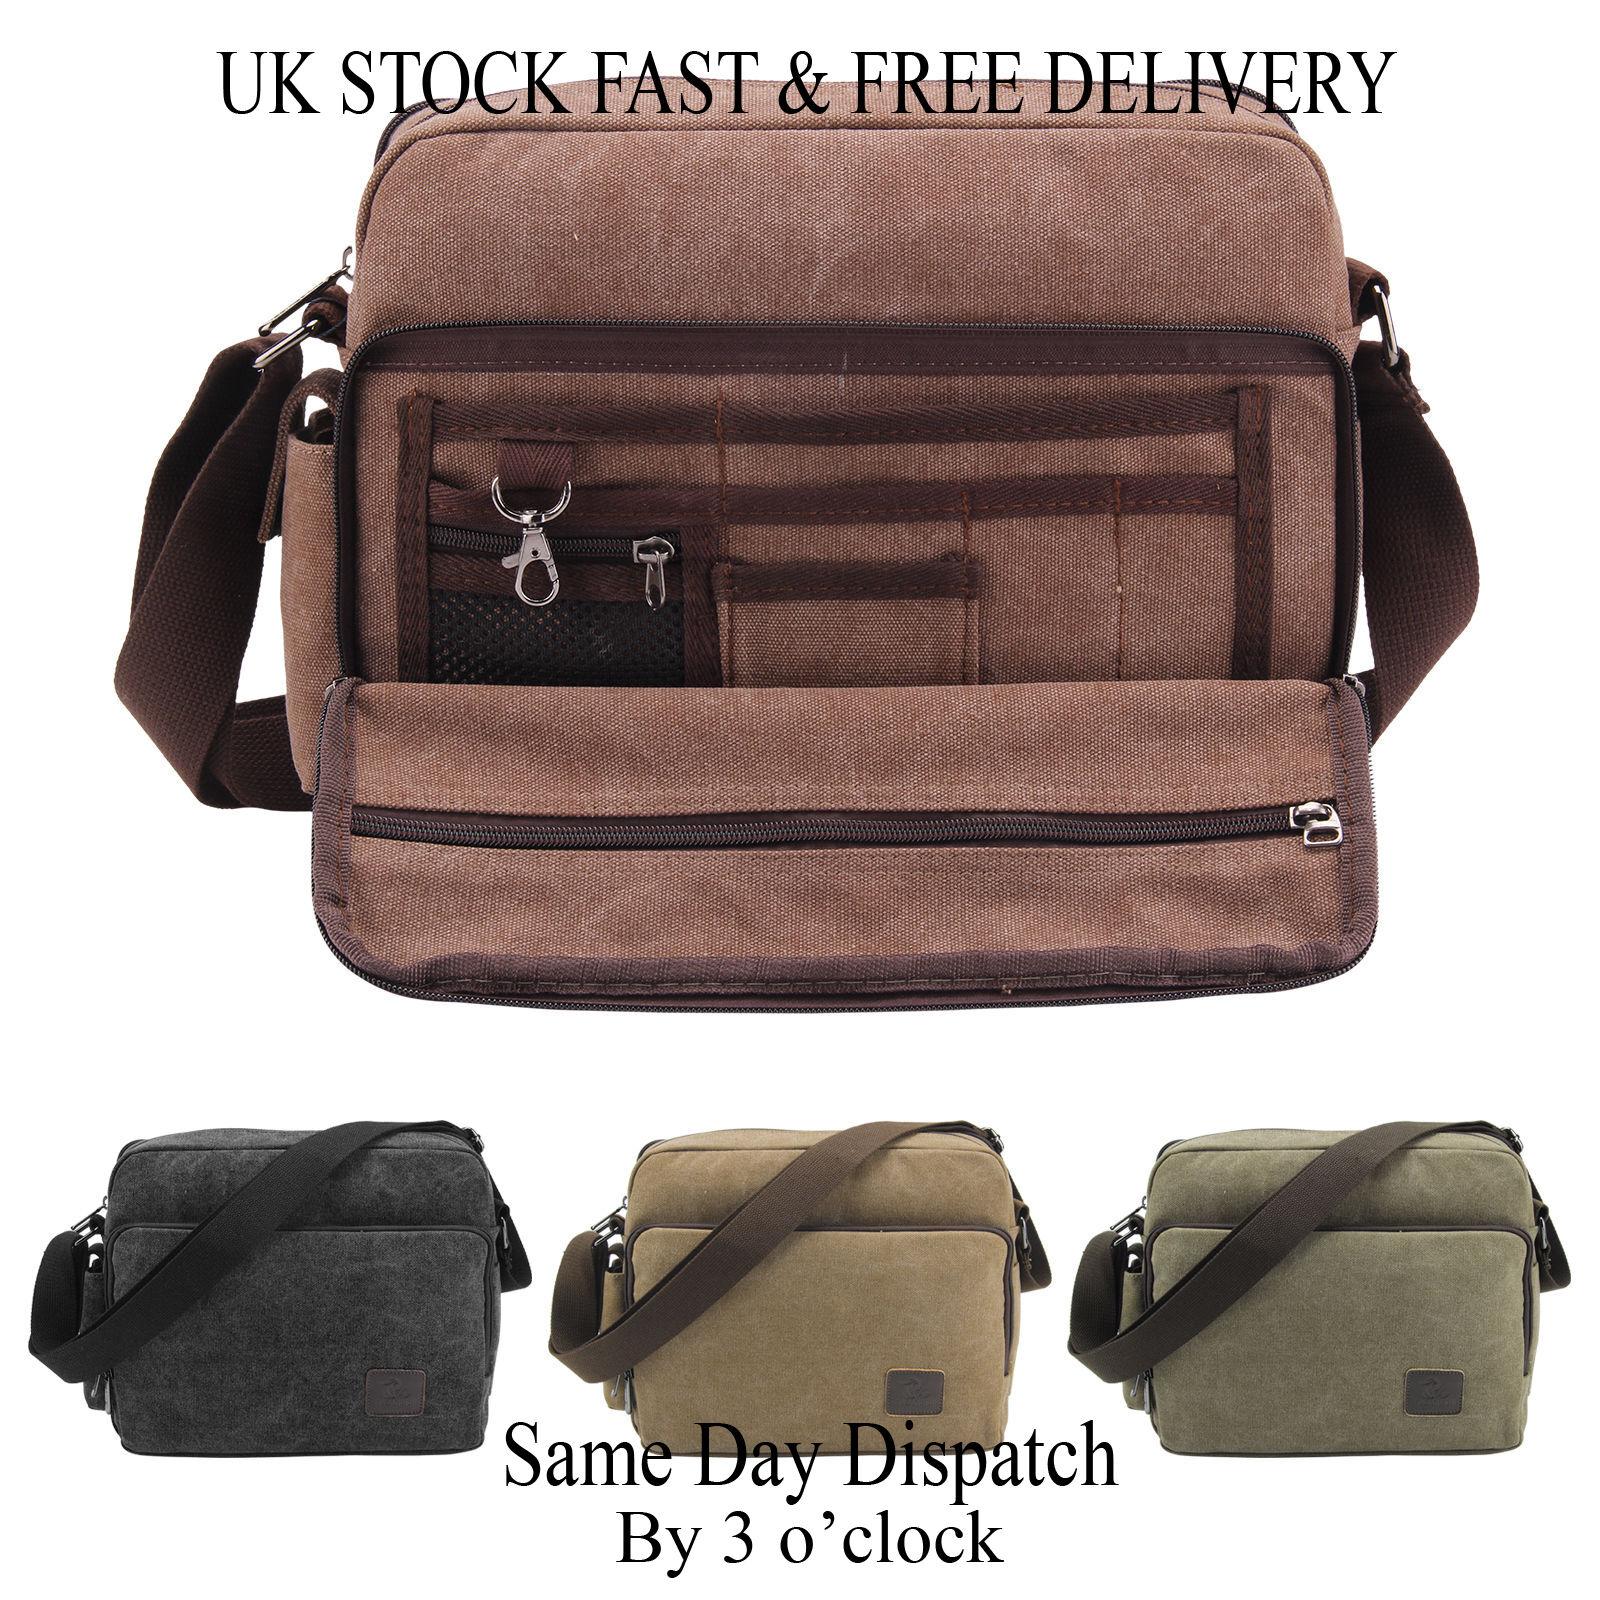 7bbe07e4a7 Vincenza Men's Retro Canvas Bag Travel Crossbody Satchel Outdoor Over  Shoulder